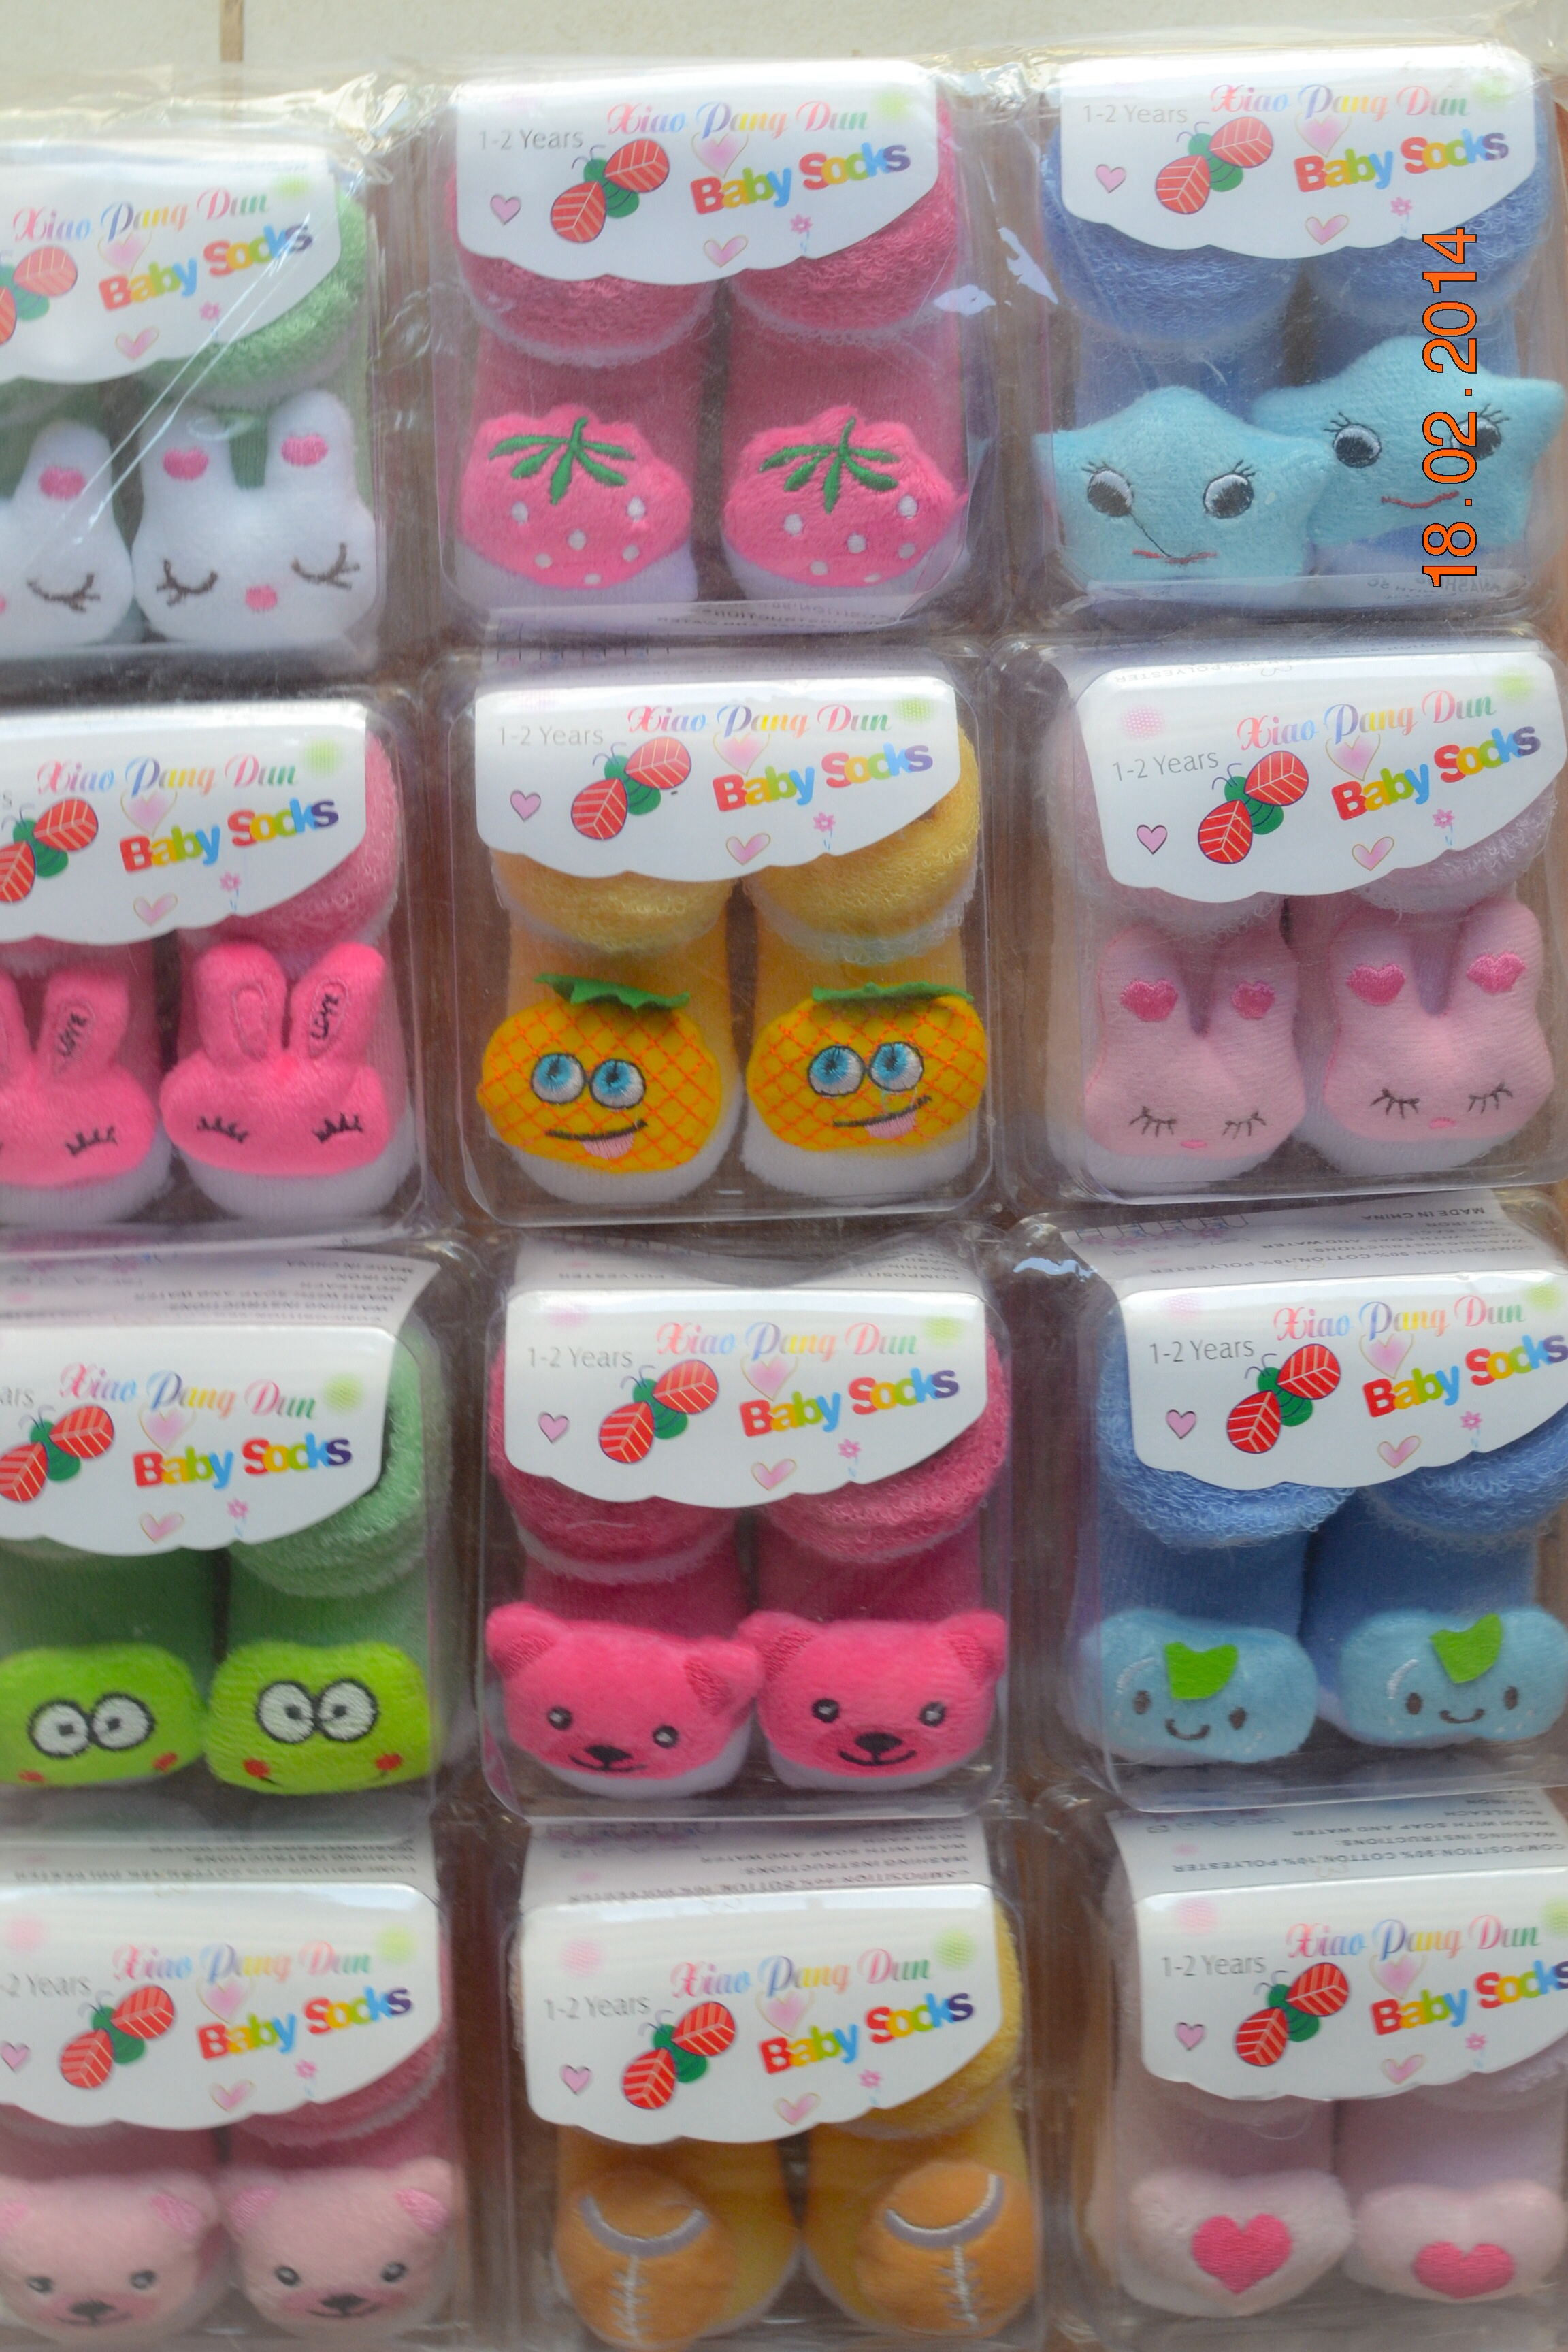 U011-2**พร้อมส่ง** (ปลีก+ส่ง) ถุงเท้าเด็ก(1- 2ปี) พับข้อ ติดหัวสัตว์ ไม่มีกันลื่น เนื้อดี งานนำเข้า ( Made in China)